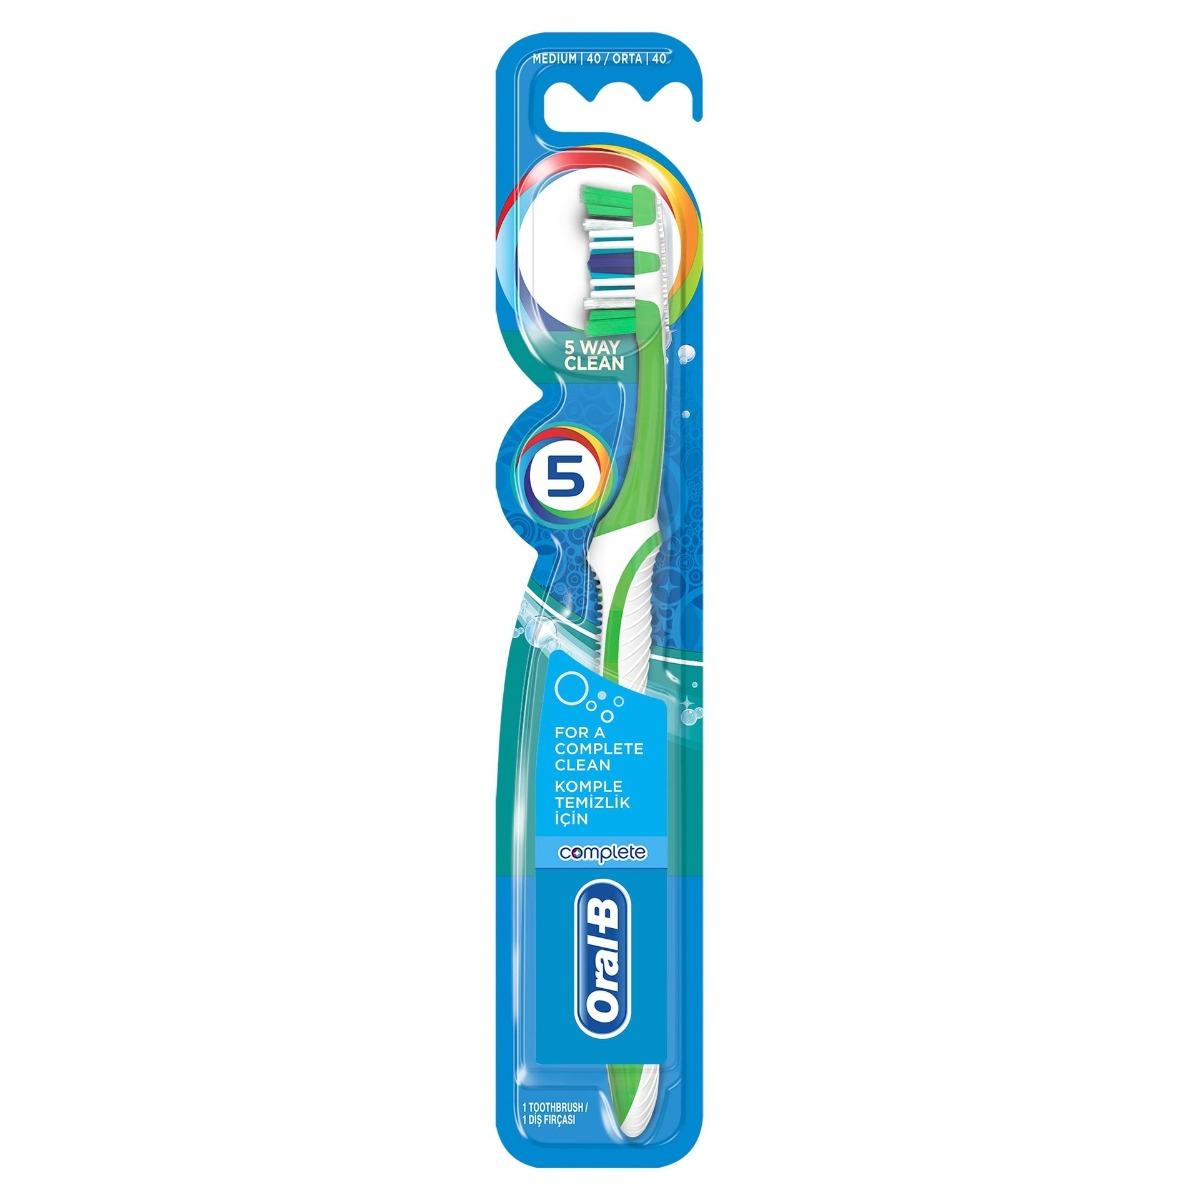 Periuta de dinti Complete 5 Way Clean 40 medium, 1 bucata, Oral-B drmax.ro